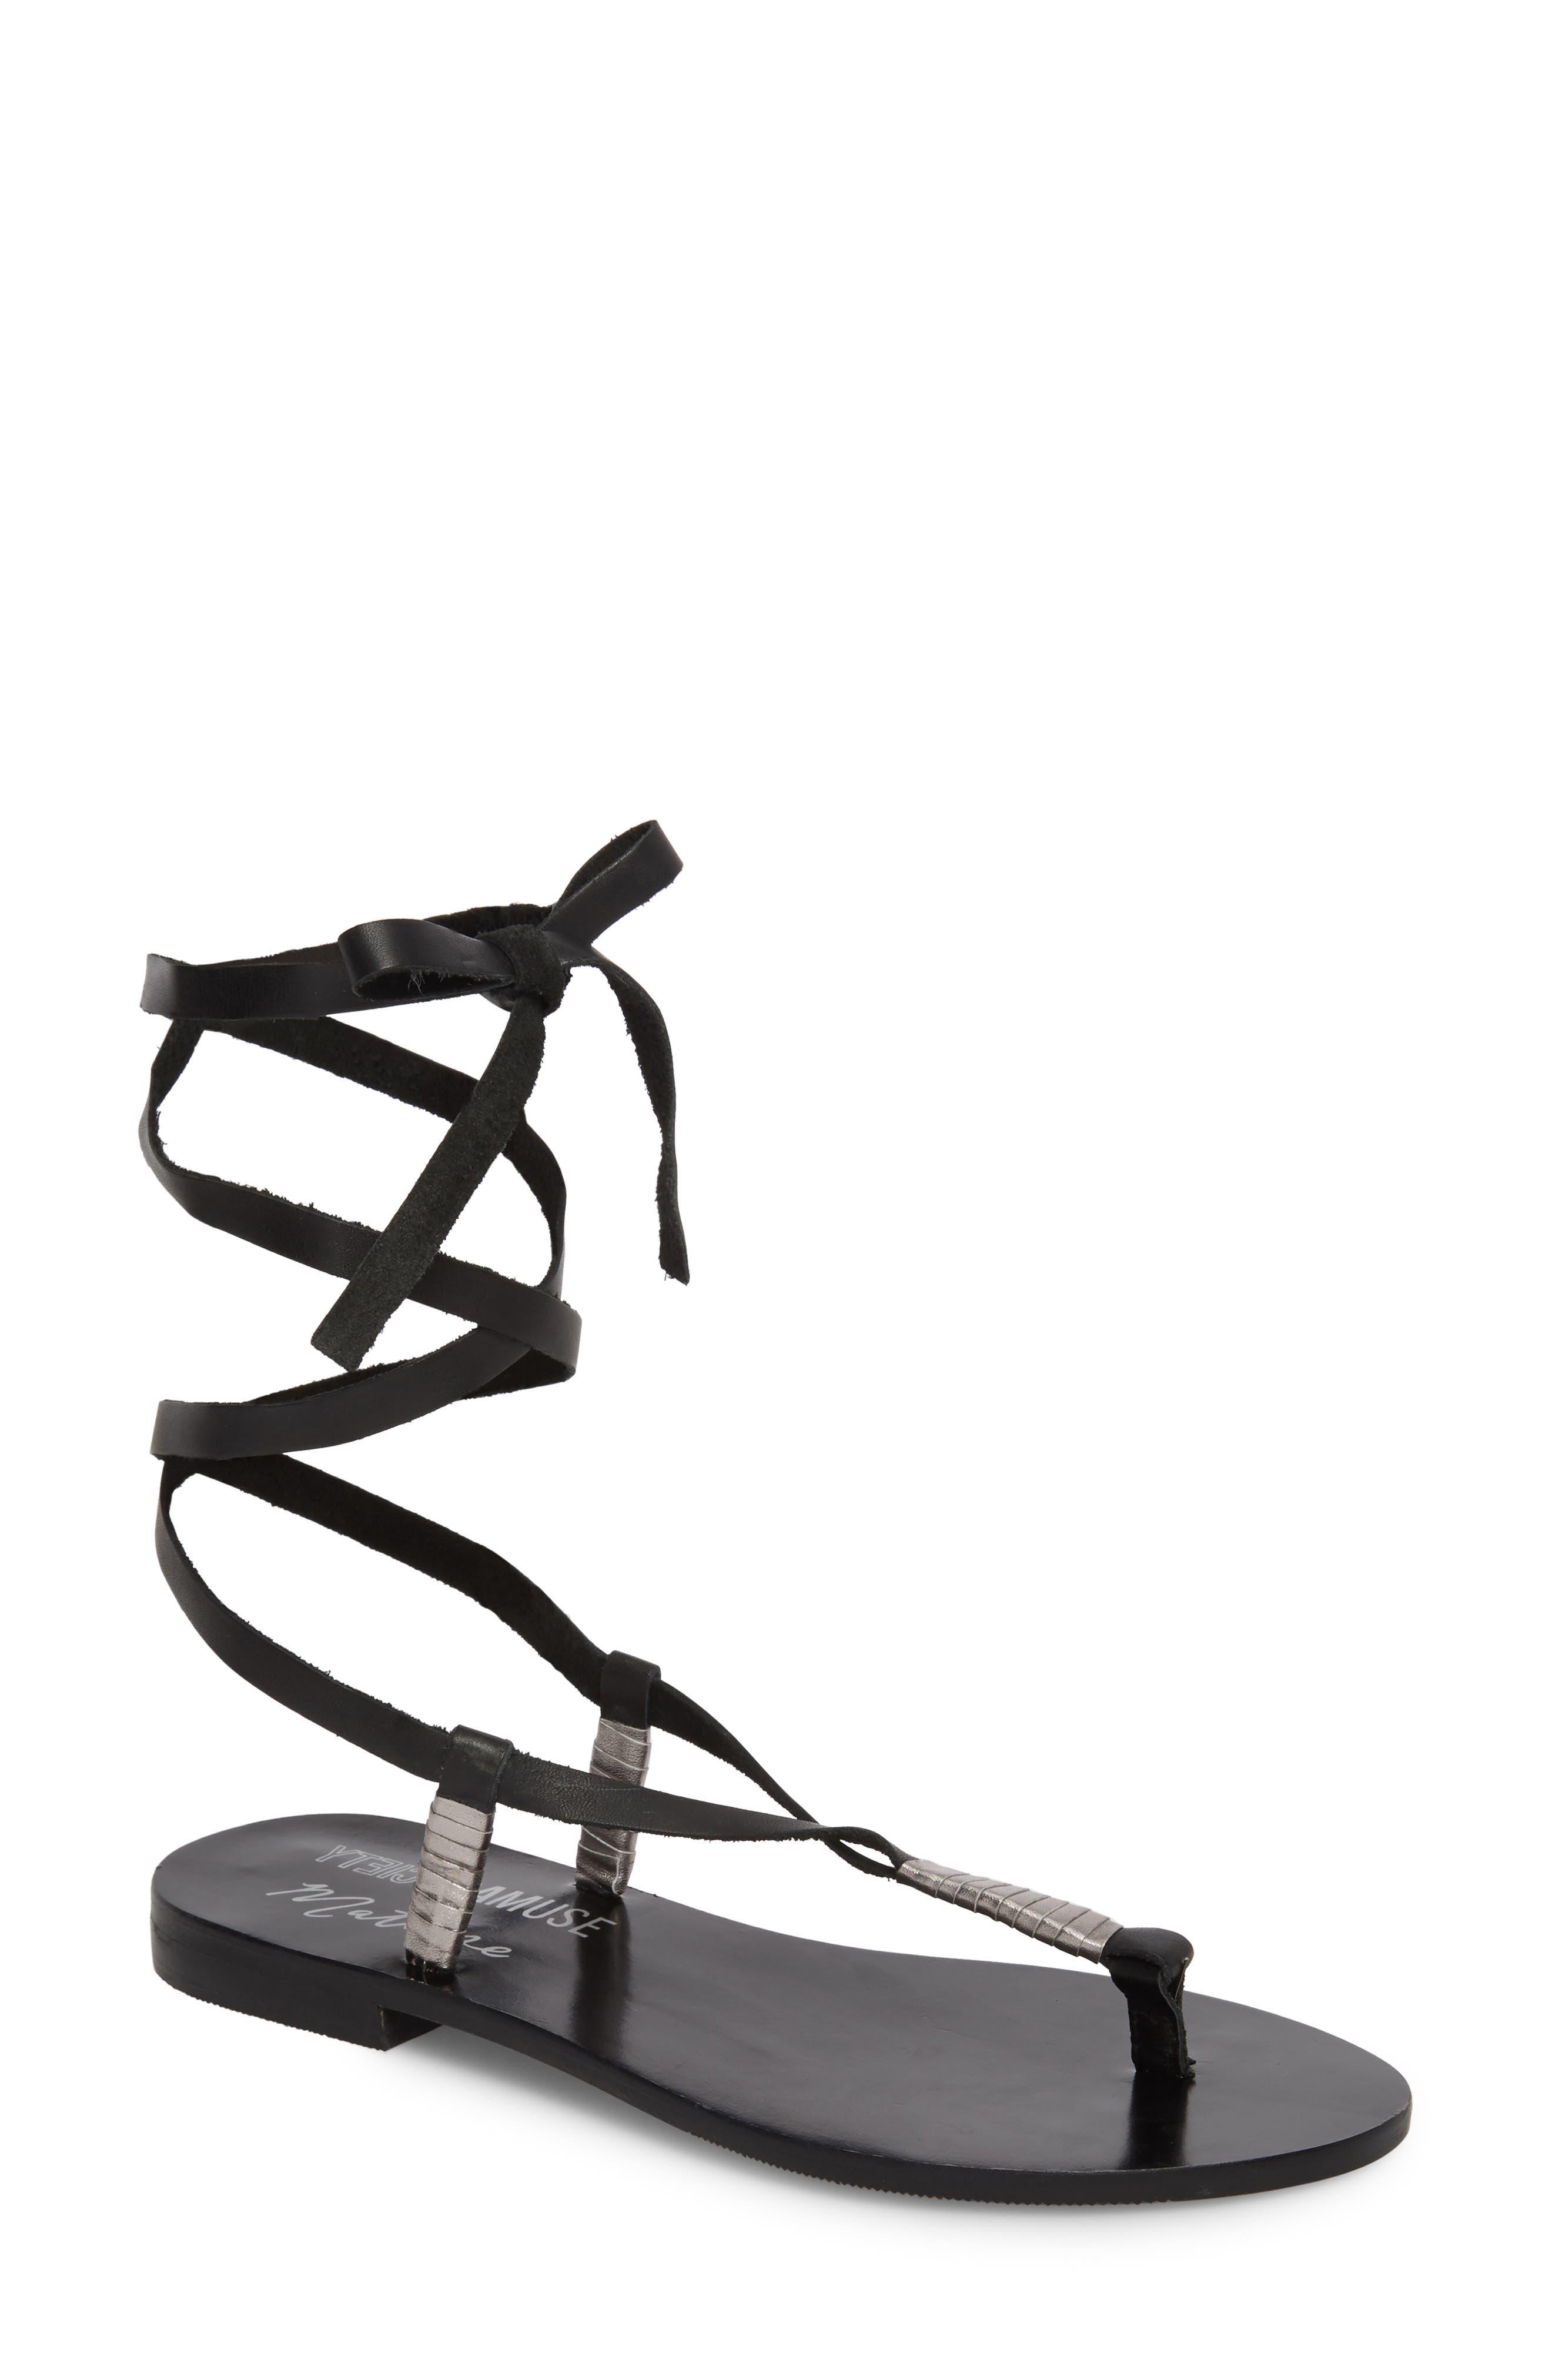 Amuse Society x Matisse Positano Sandal,                         Main,                         color, BLACK LEATHER